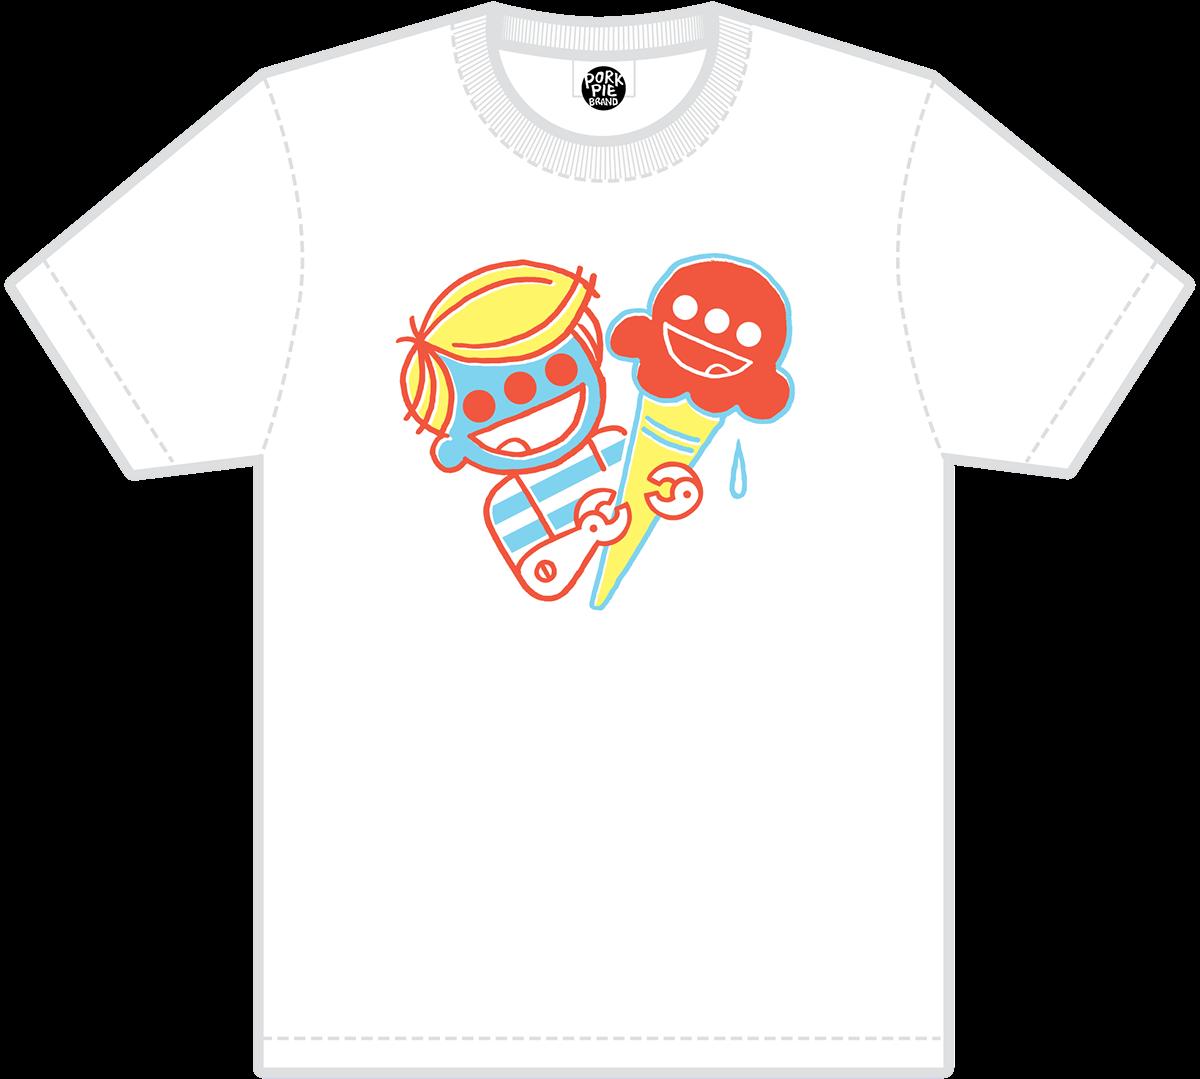 tshirt Clothing garment Retail Candy ice cream robot monster mutant